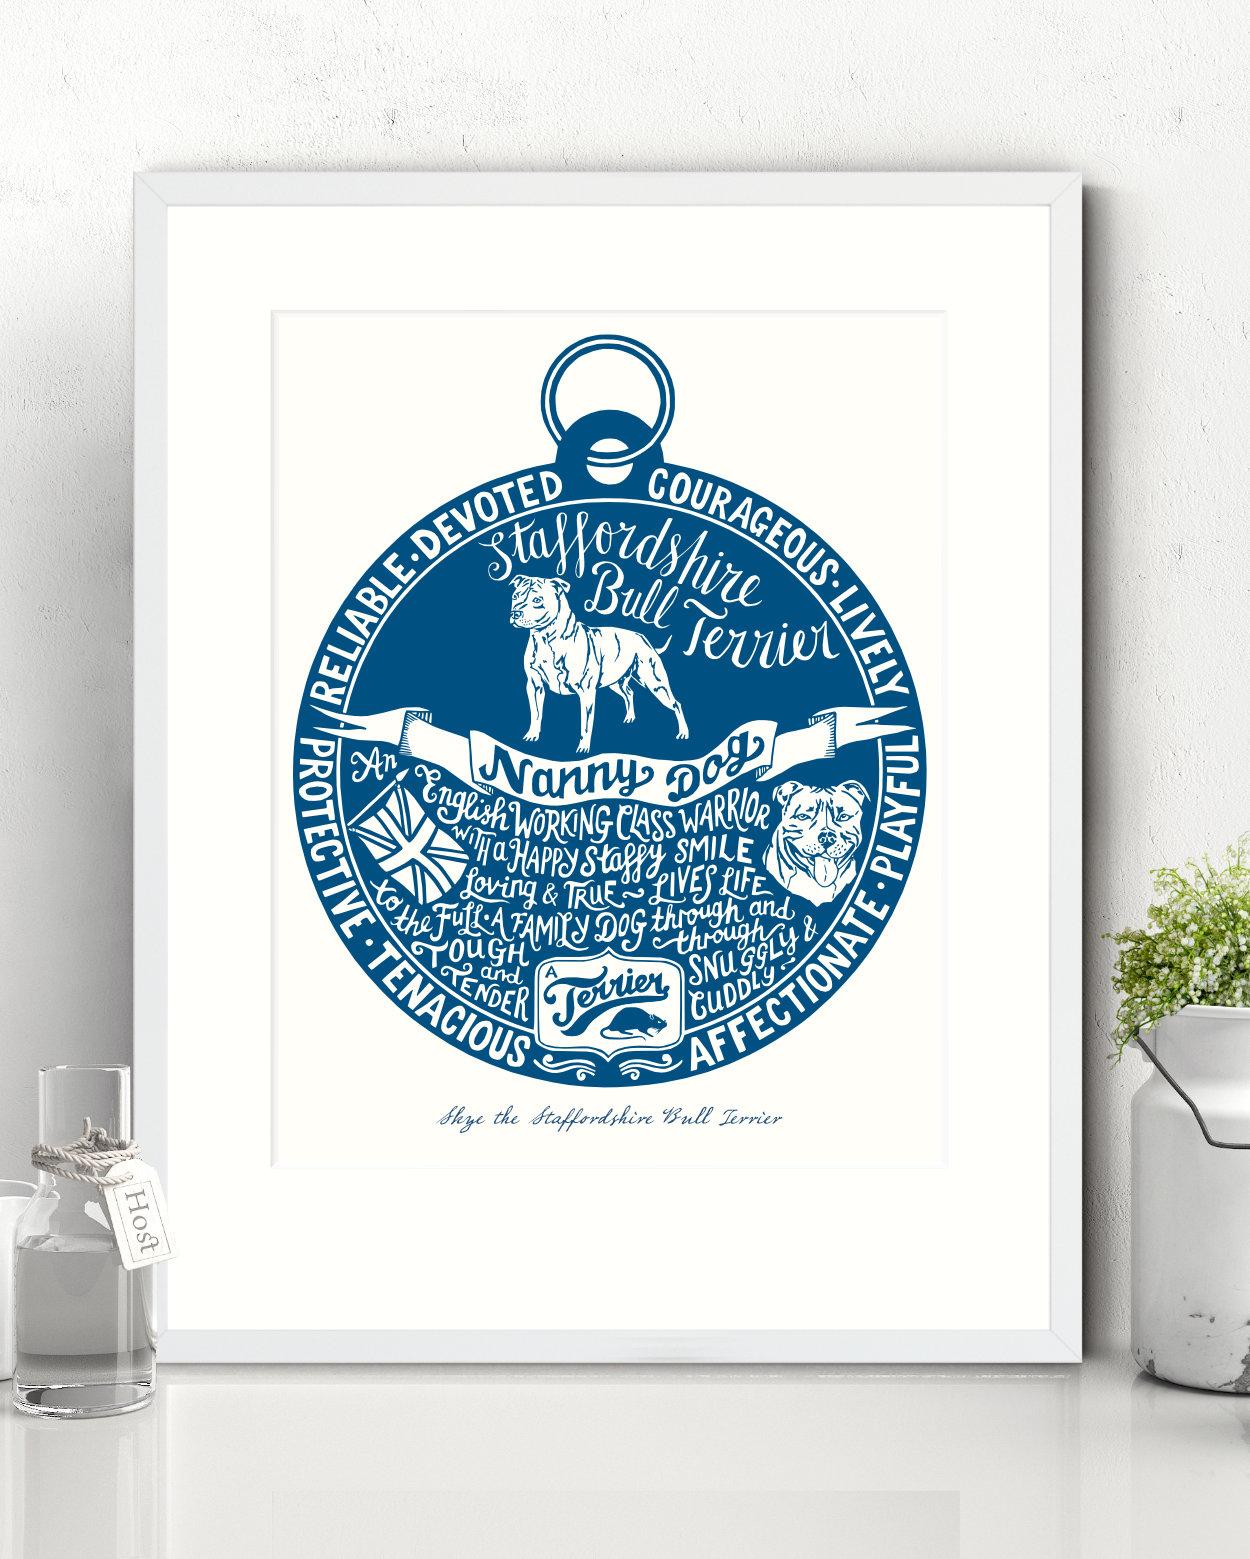 Staffordshire Bull Terrier Illustrated Art Print | The Enlightened Hound